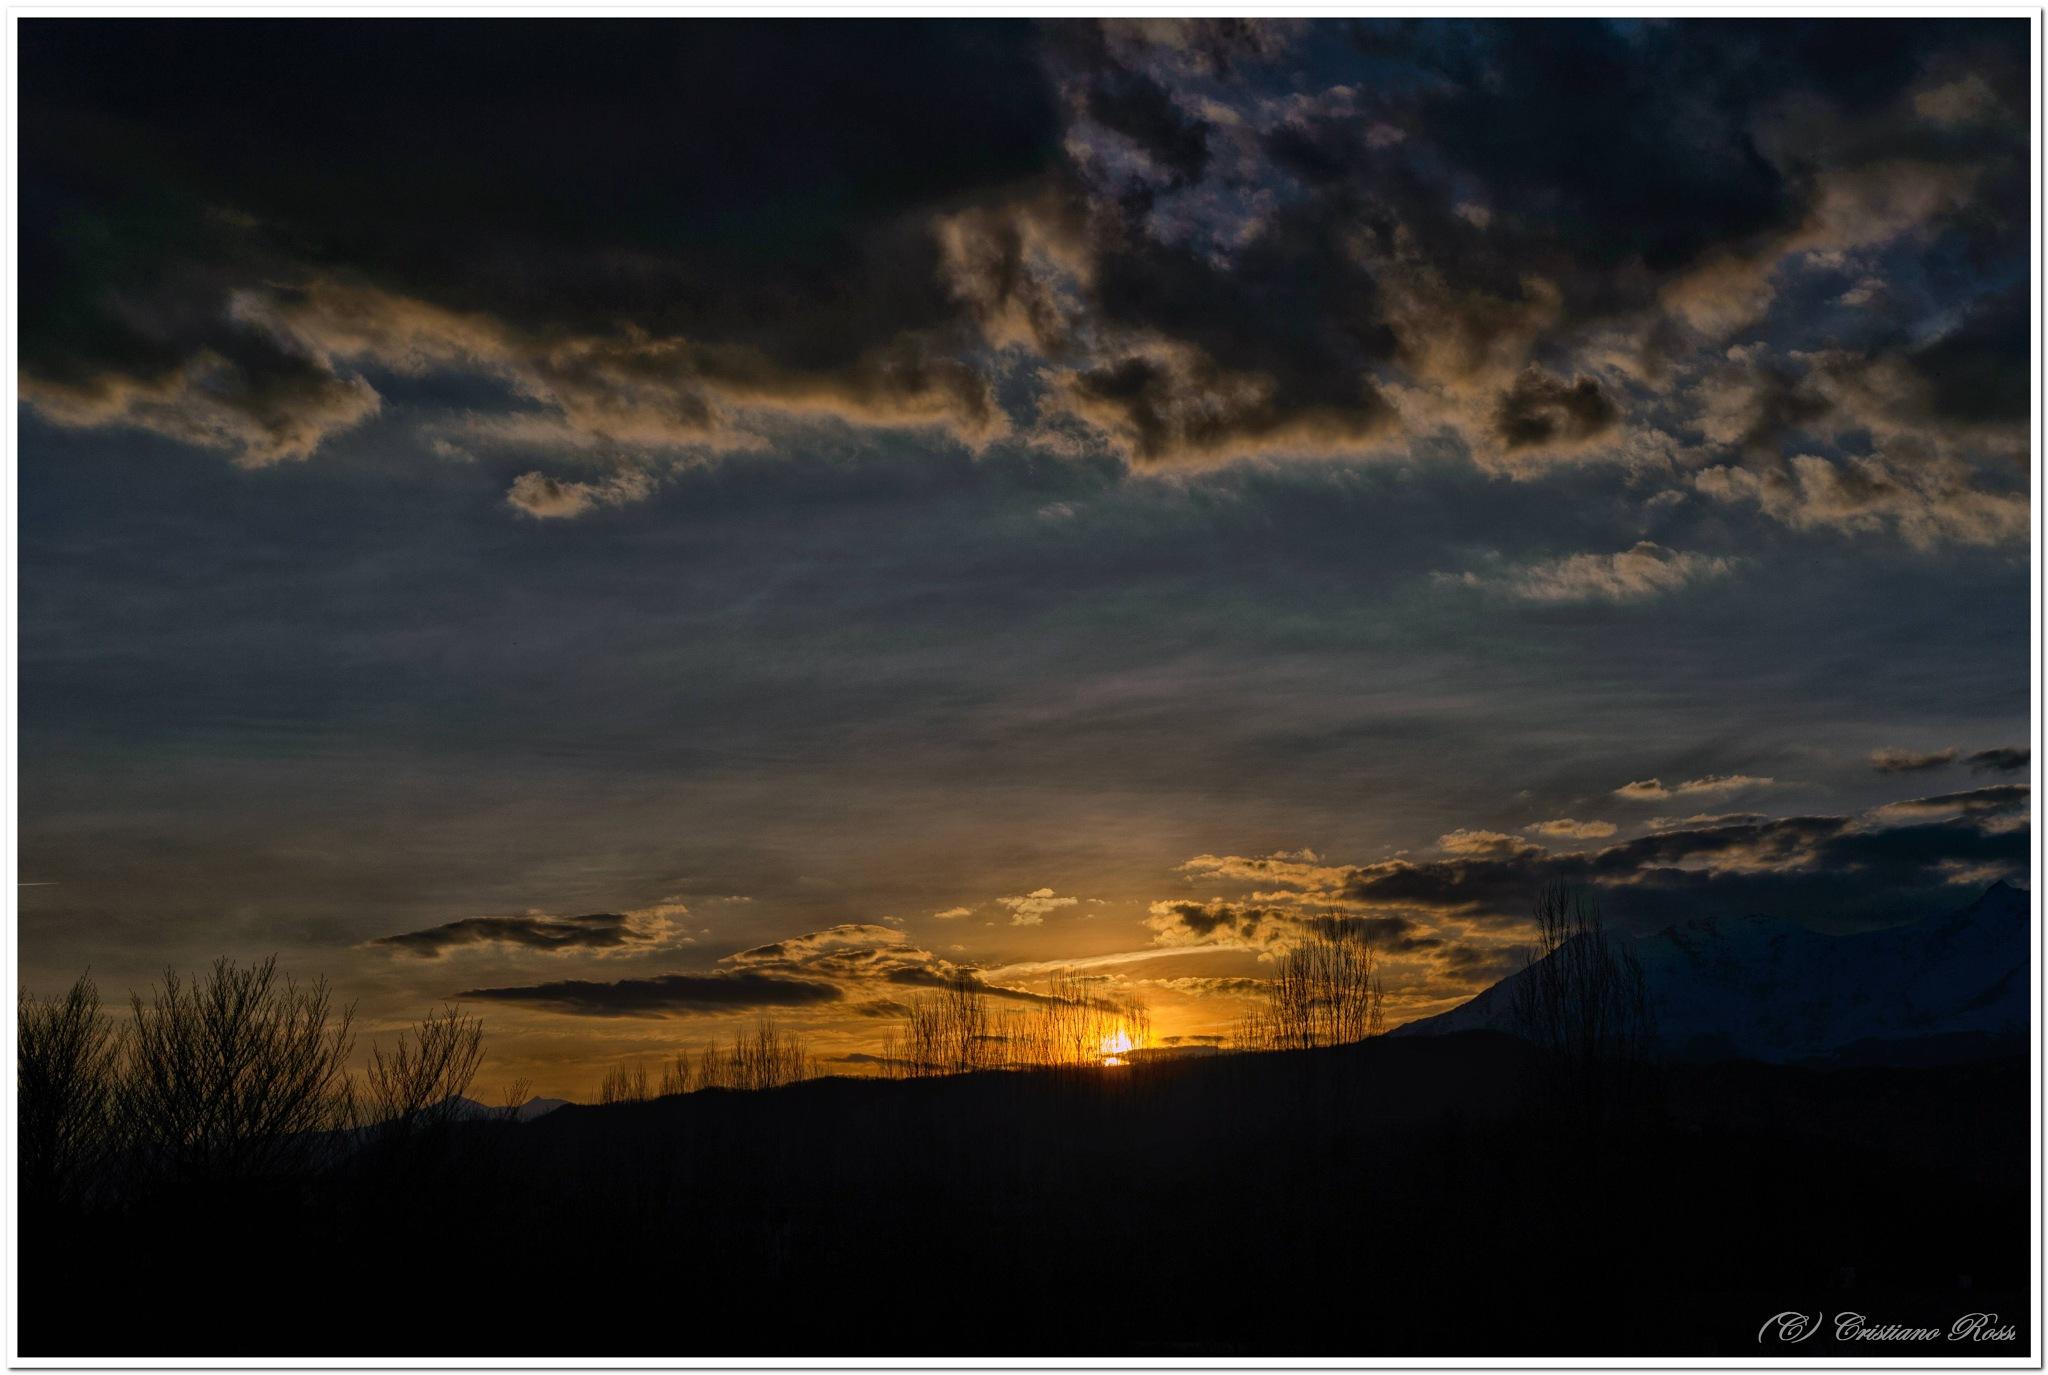 Tramonto primaverile sulle alpi - Spring sunset on the Alps by Cristiano Rossi